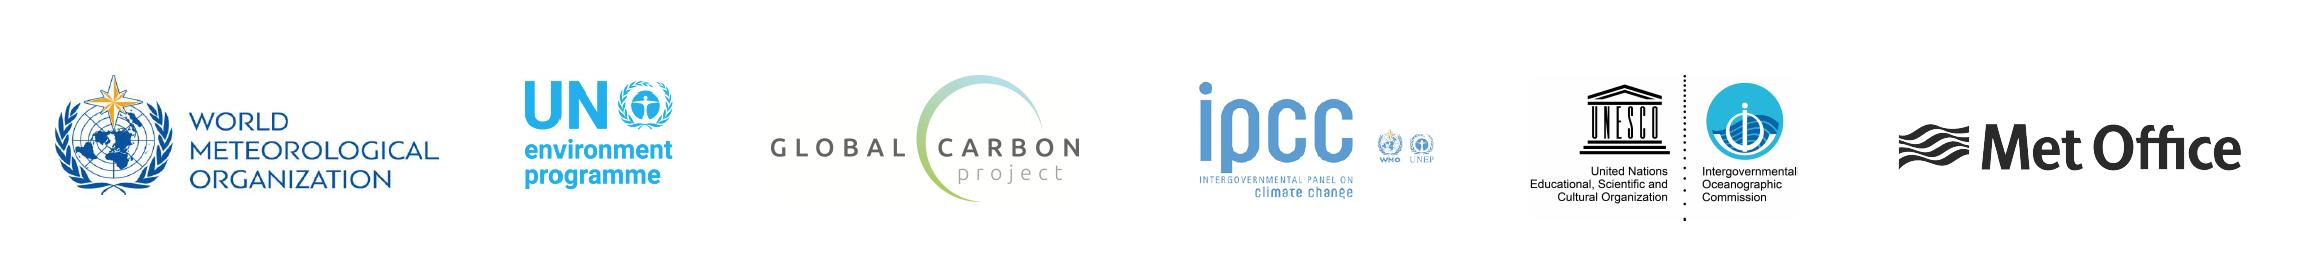 United in Science 2020 Logos